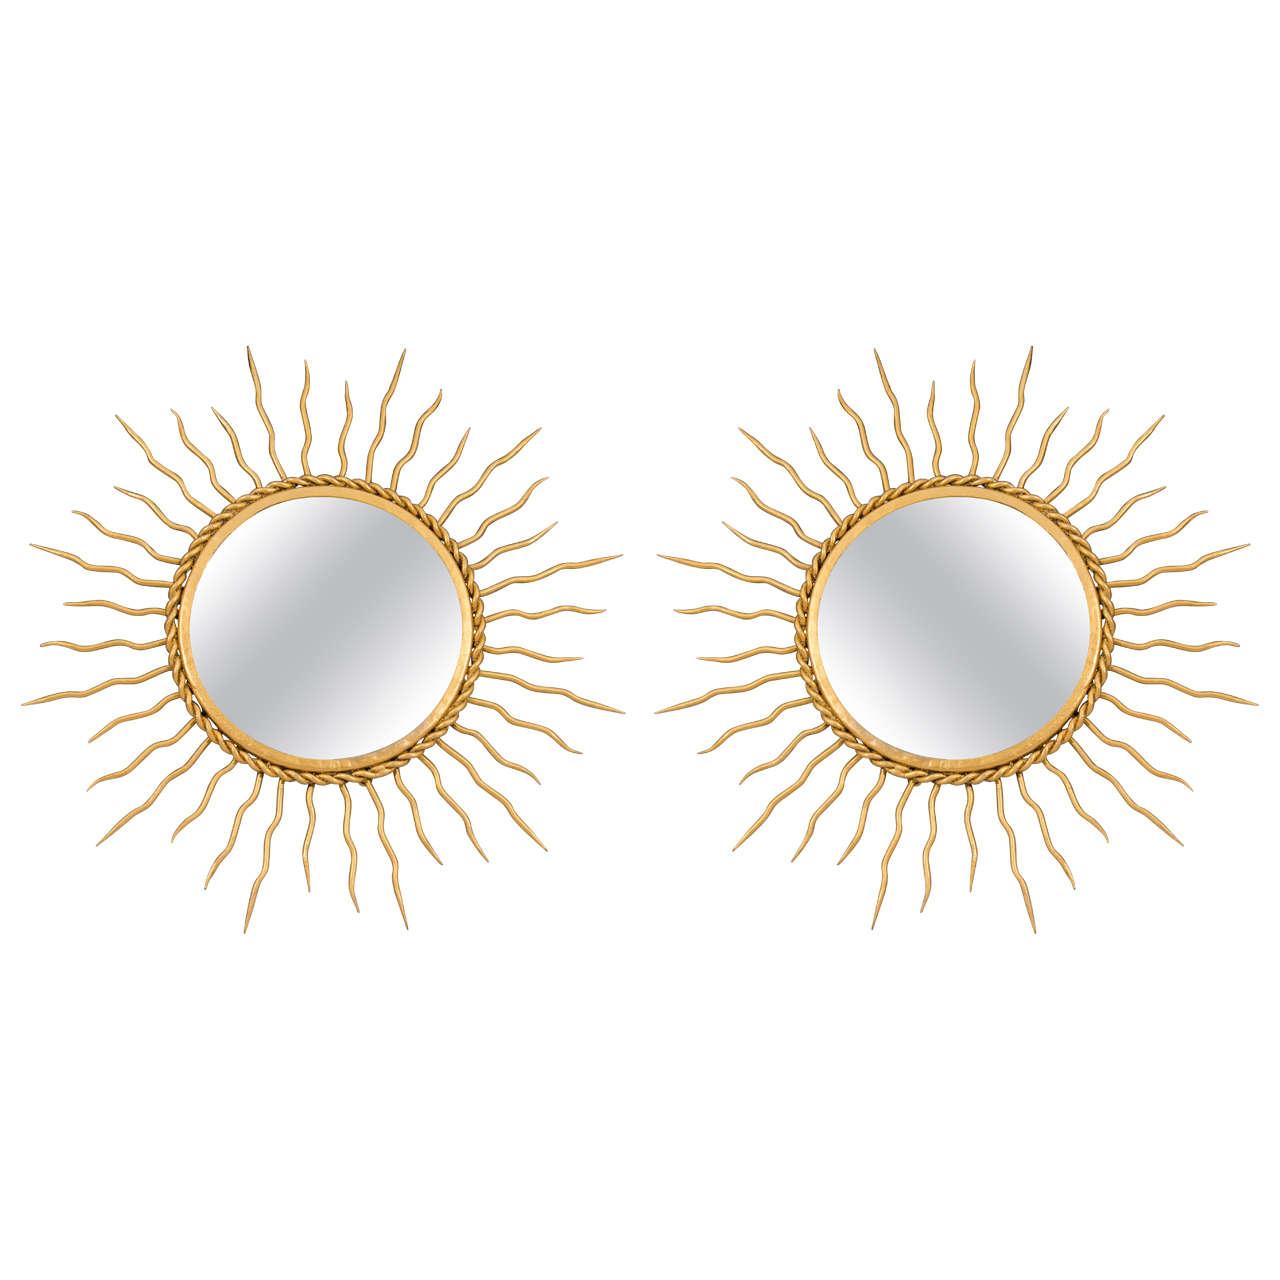 Midcentury Pair of Starburst Wall Mirrors